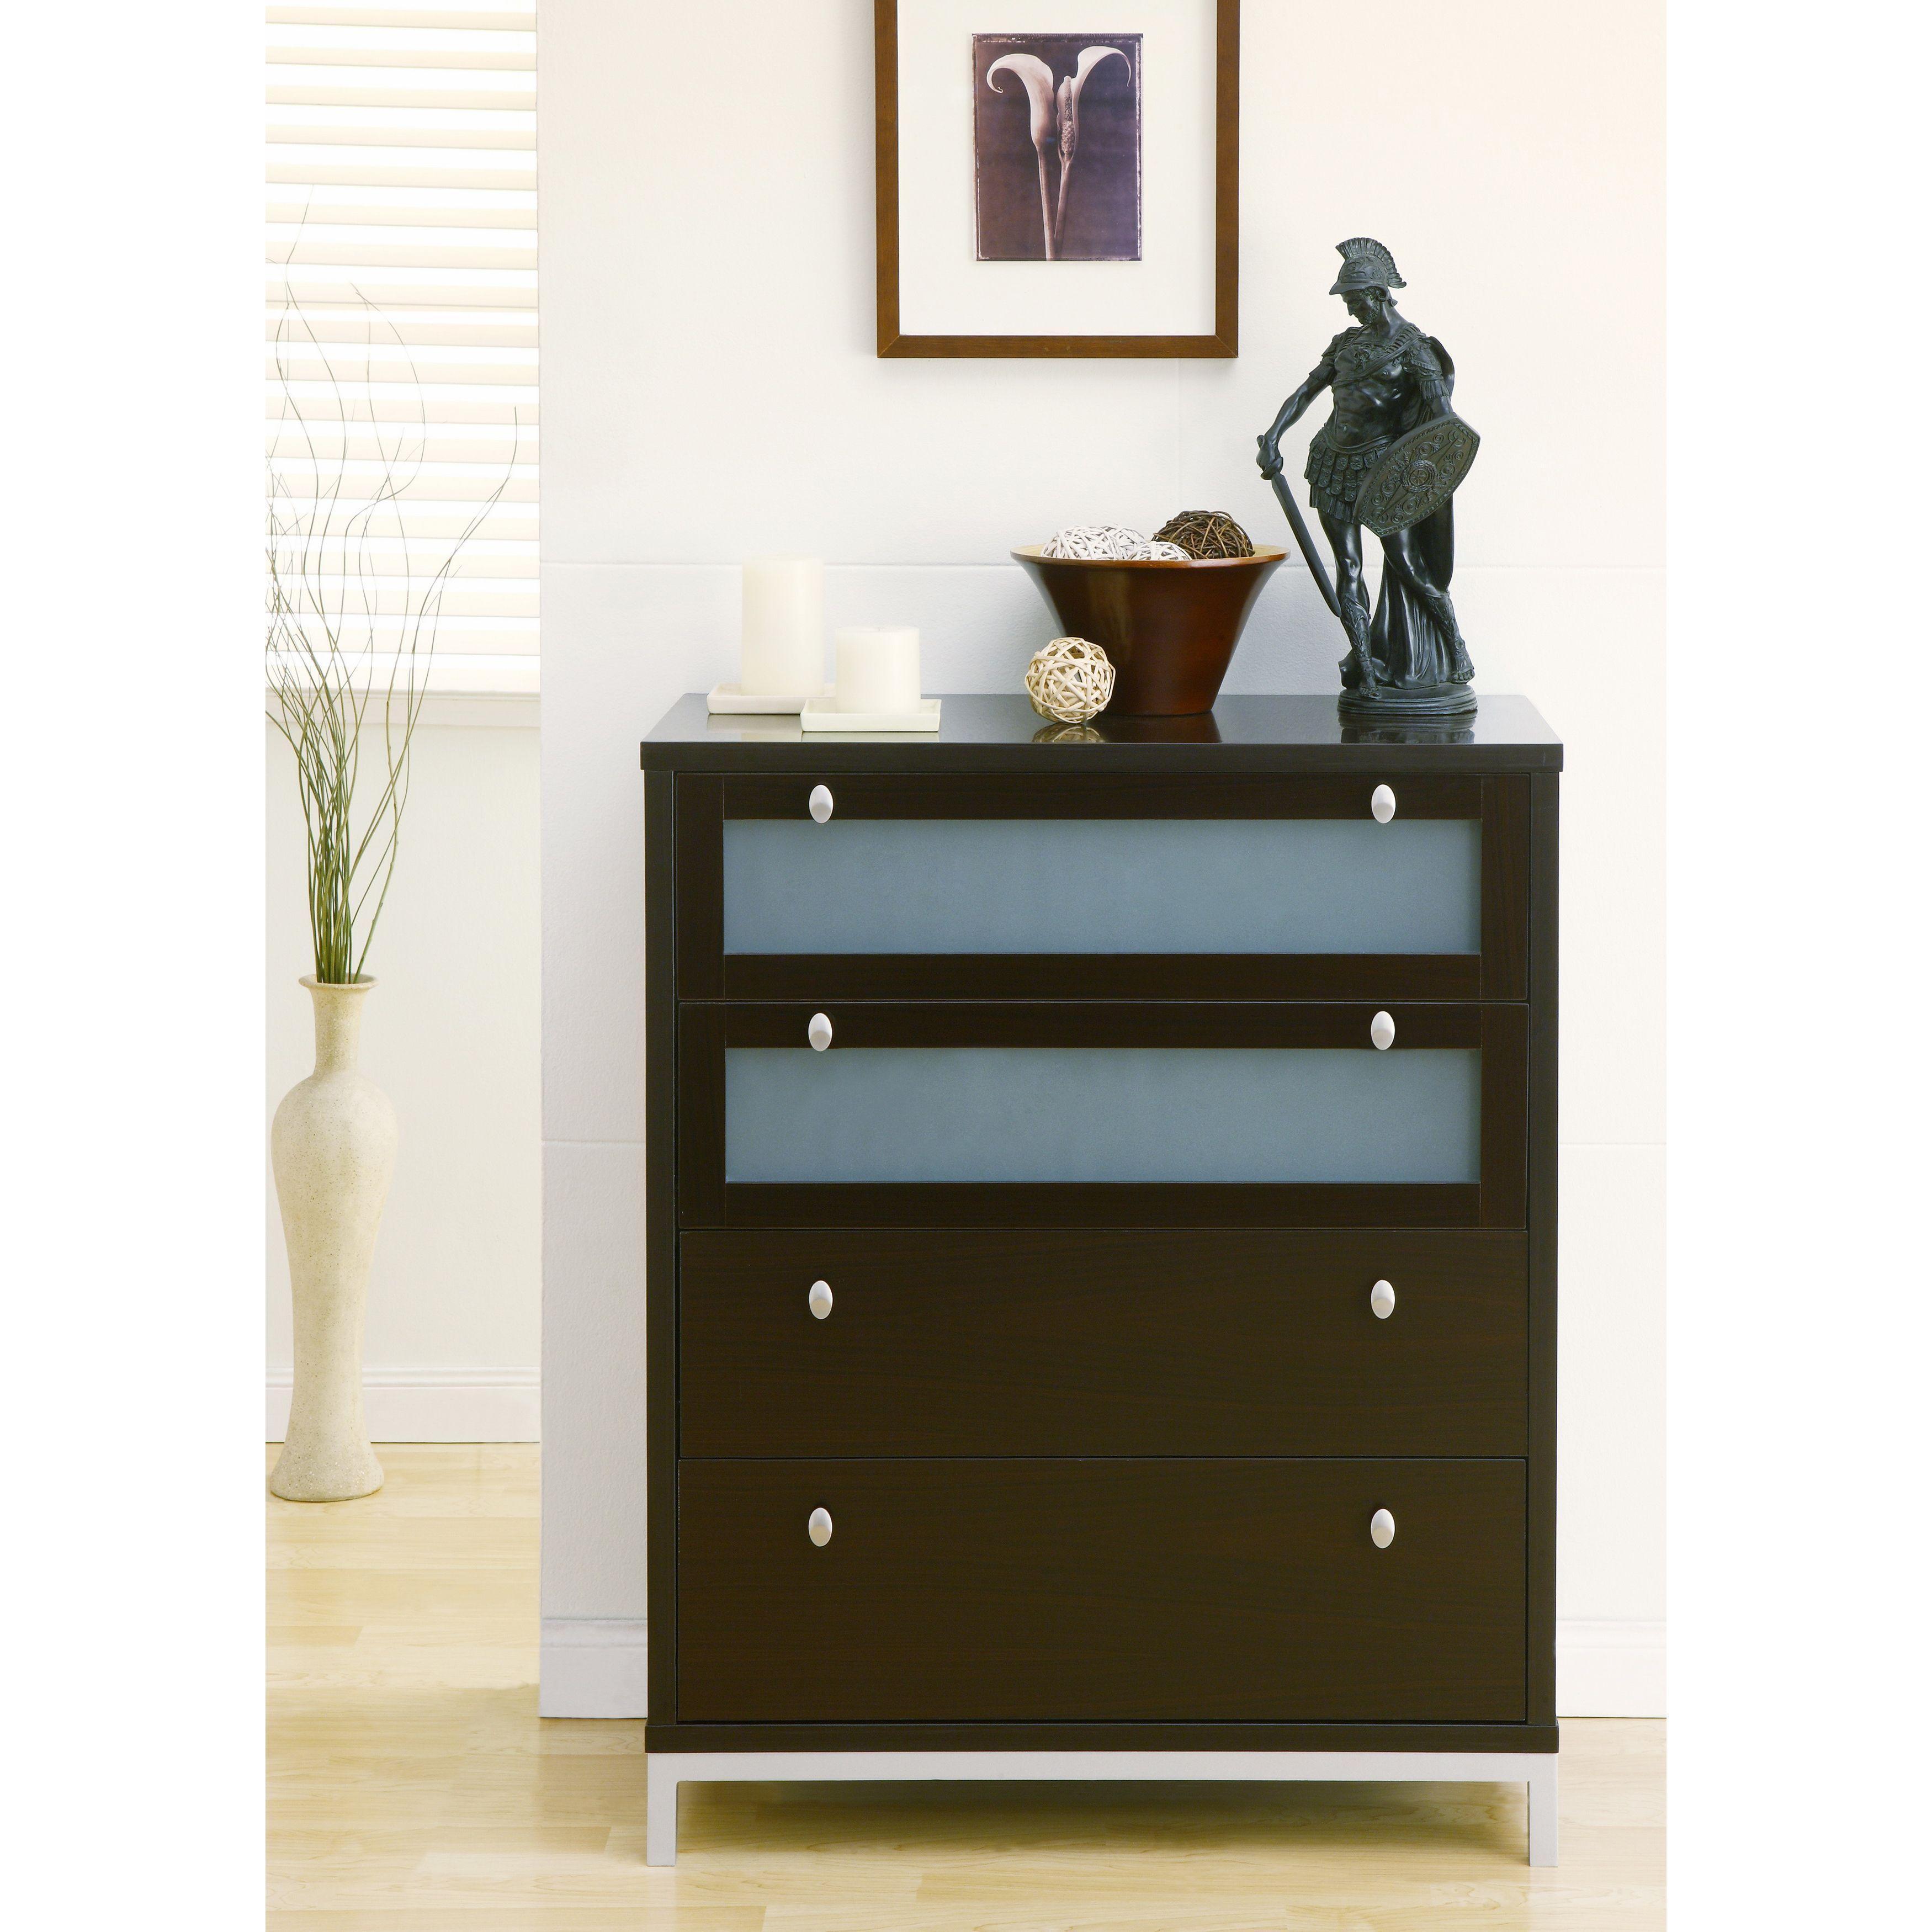 Furniture of america modern drawer wood metal chest coffee bean